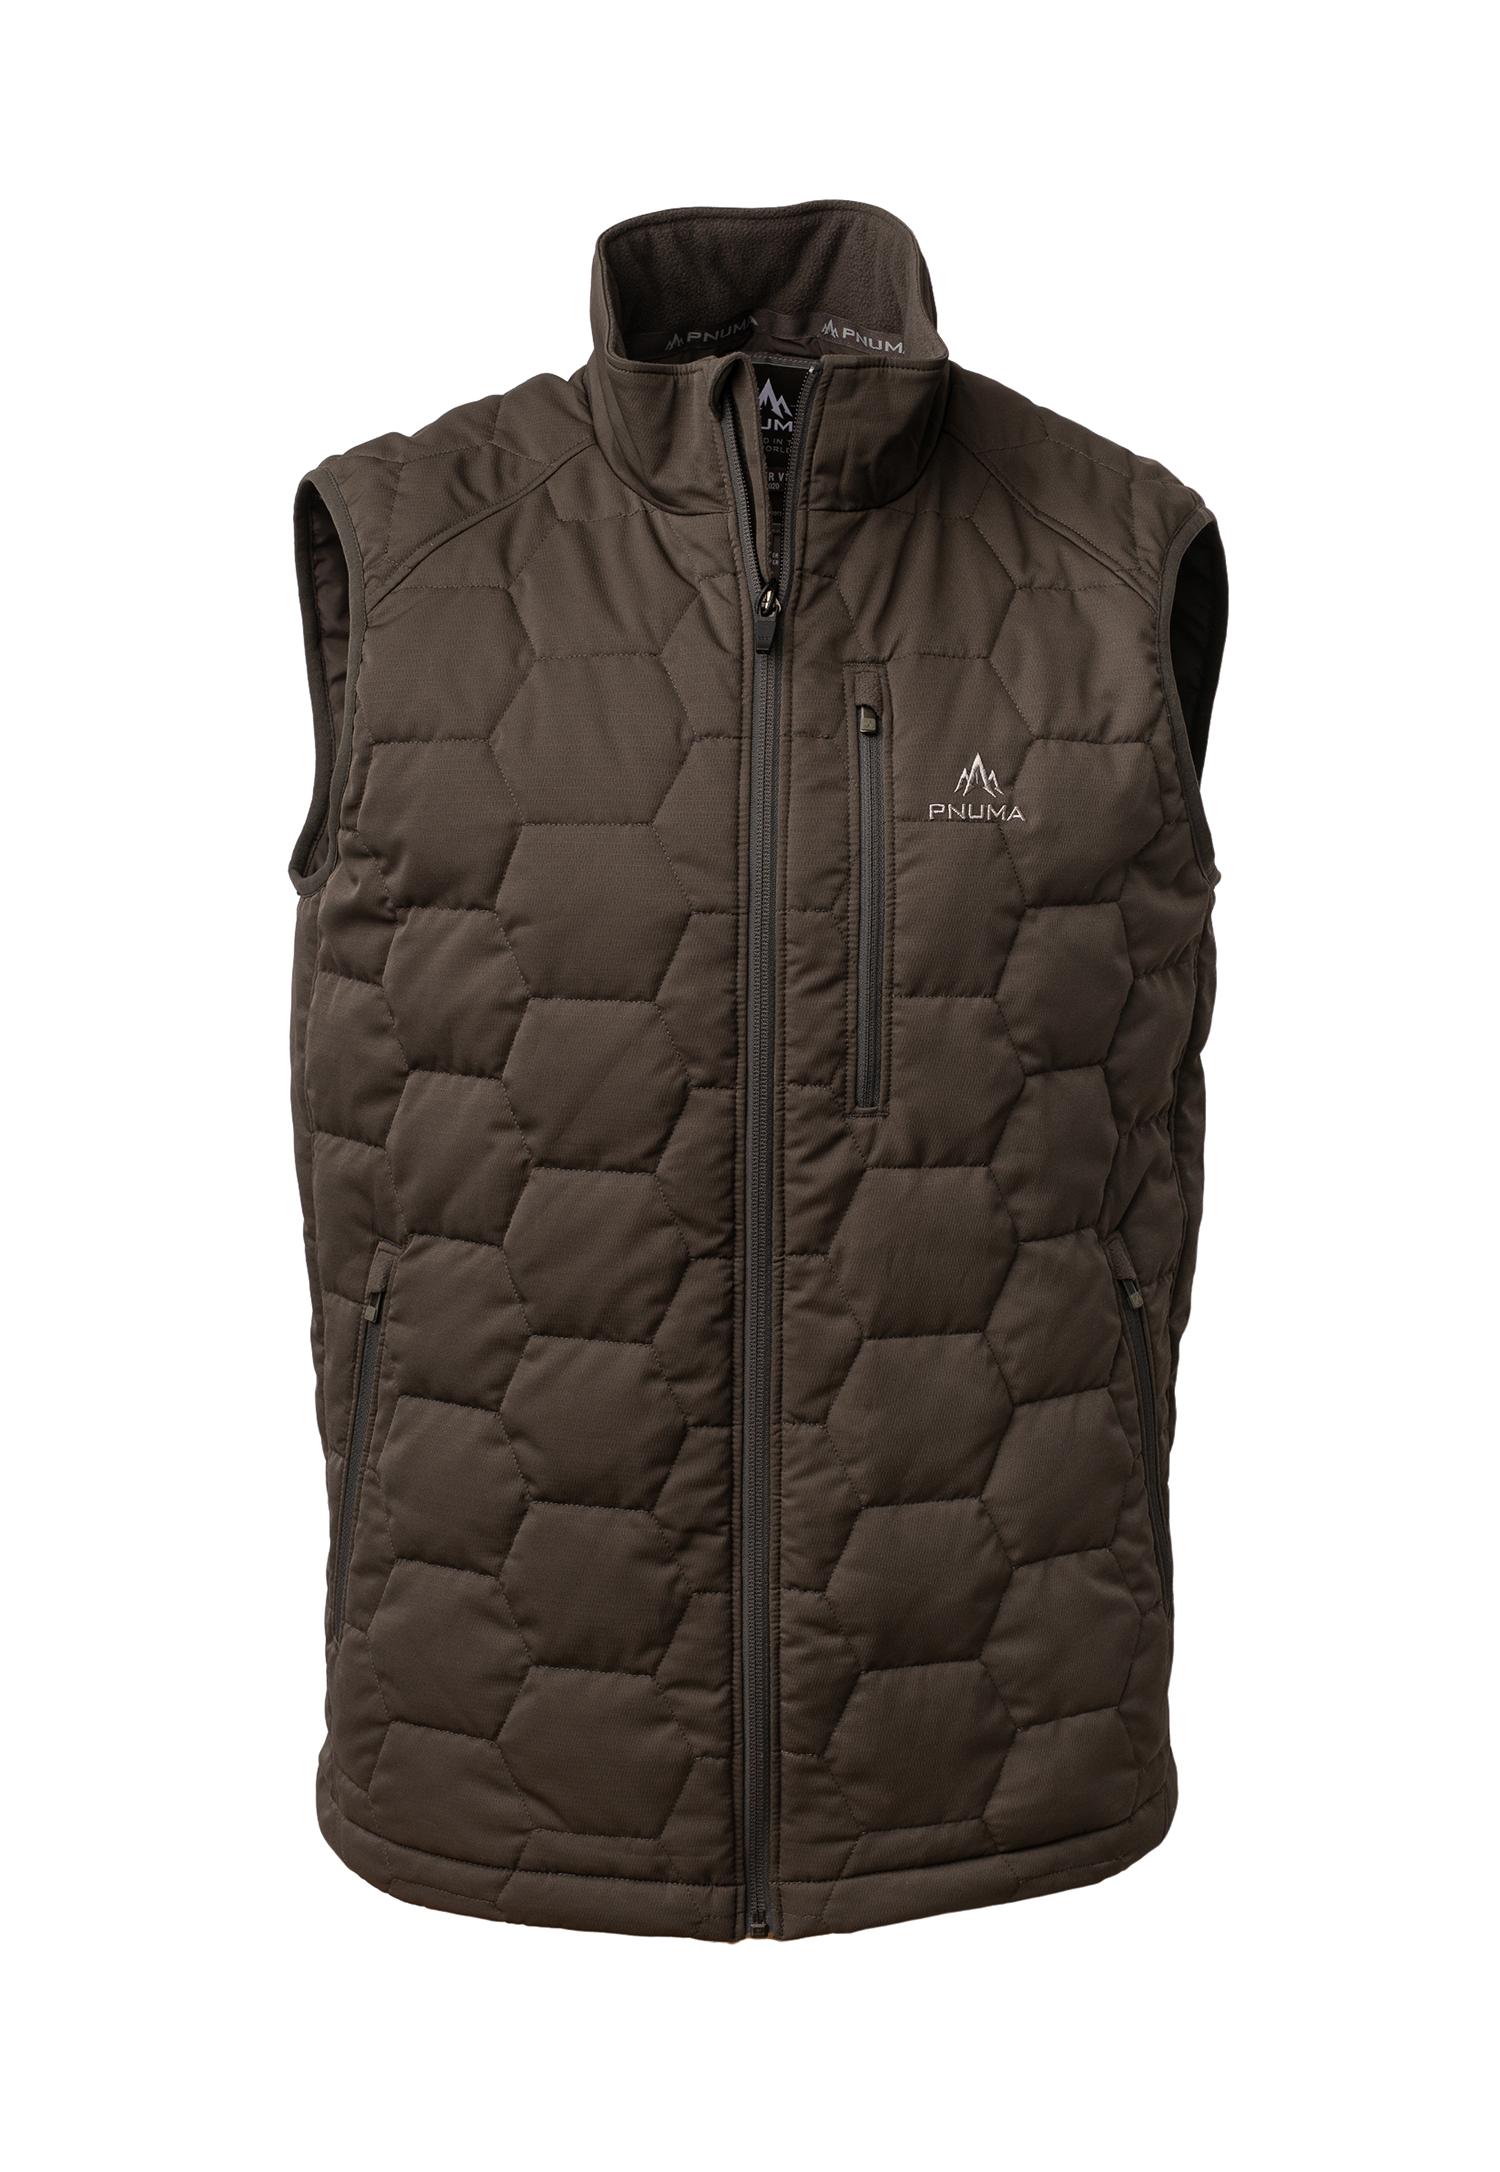 Insulator Vest - Solid